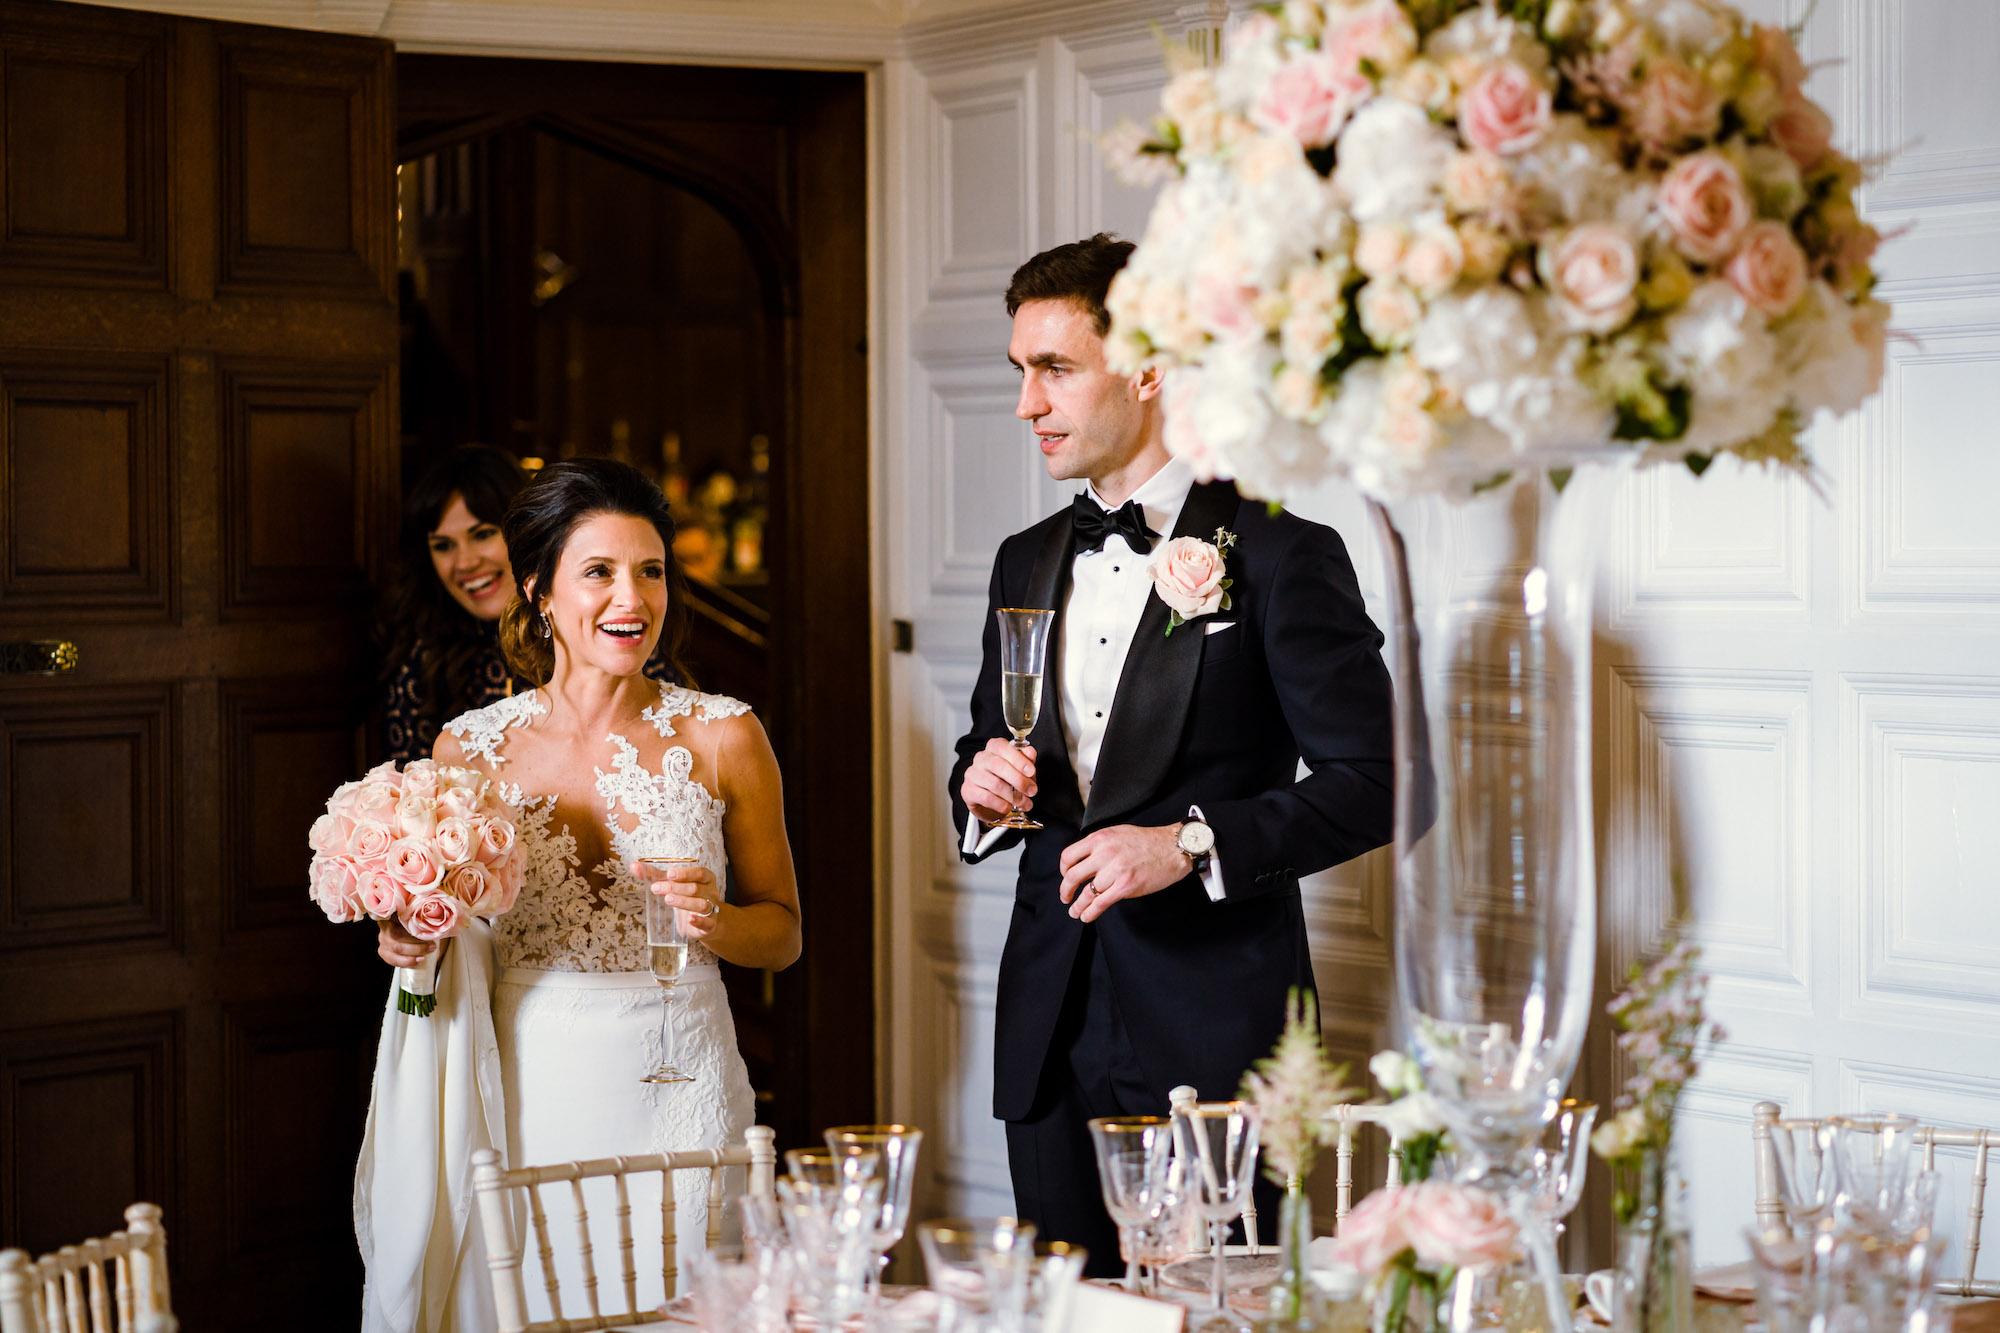 68   Hengrave Hall Wedding   Suffolk Wedding   Lamare London   Luxury Wedding Planner   Jon Mold Photography.jpg